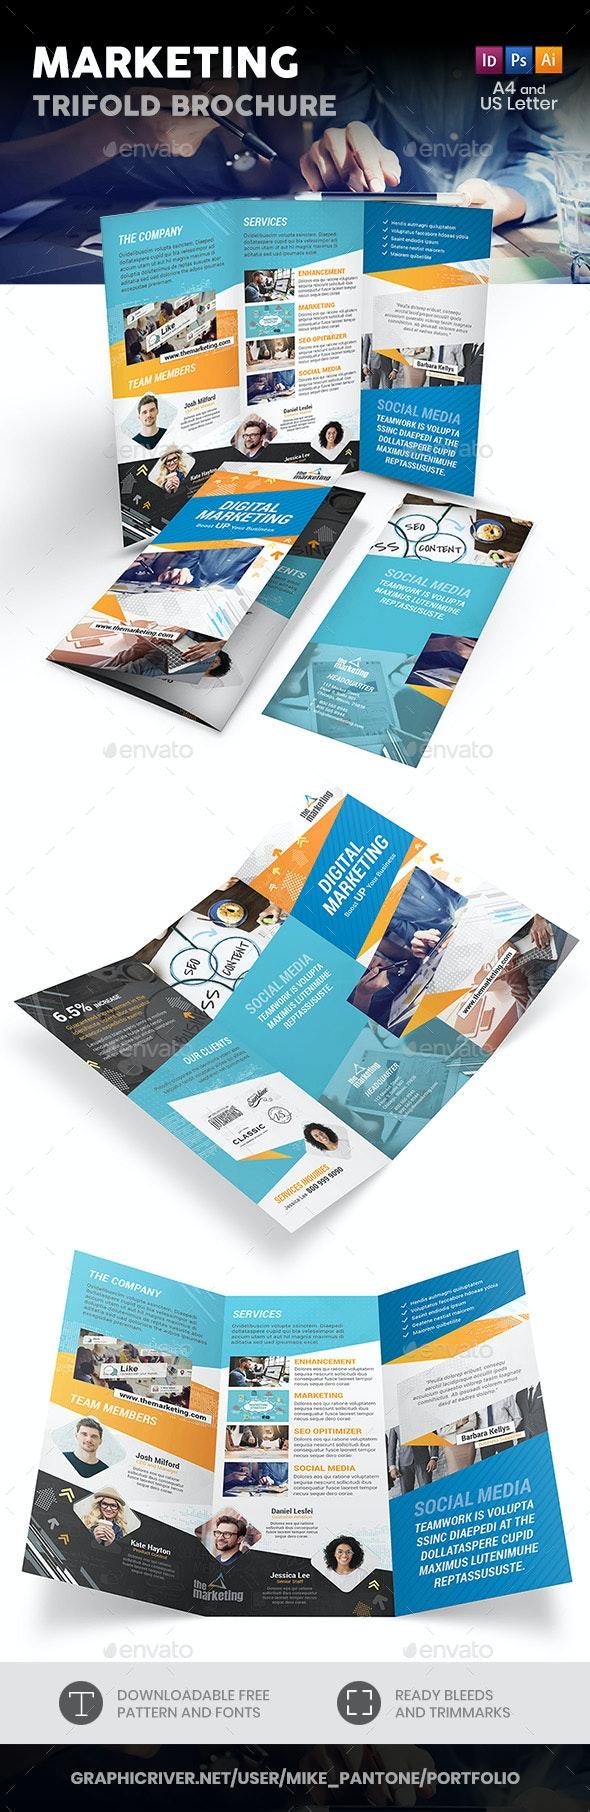 Marketing Trifold Brochure - Informational Brochures